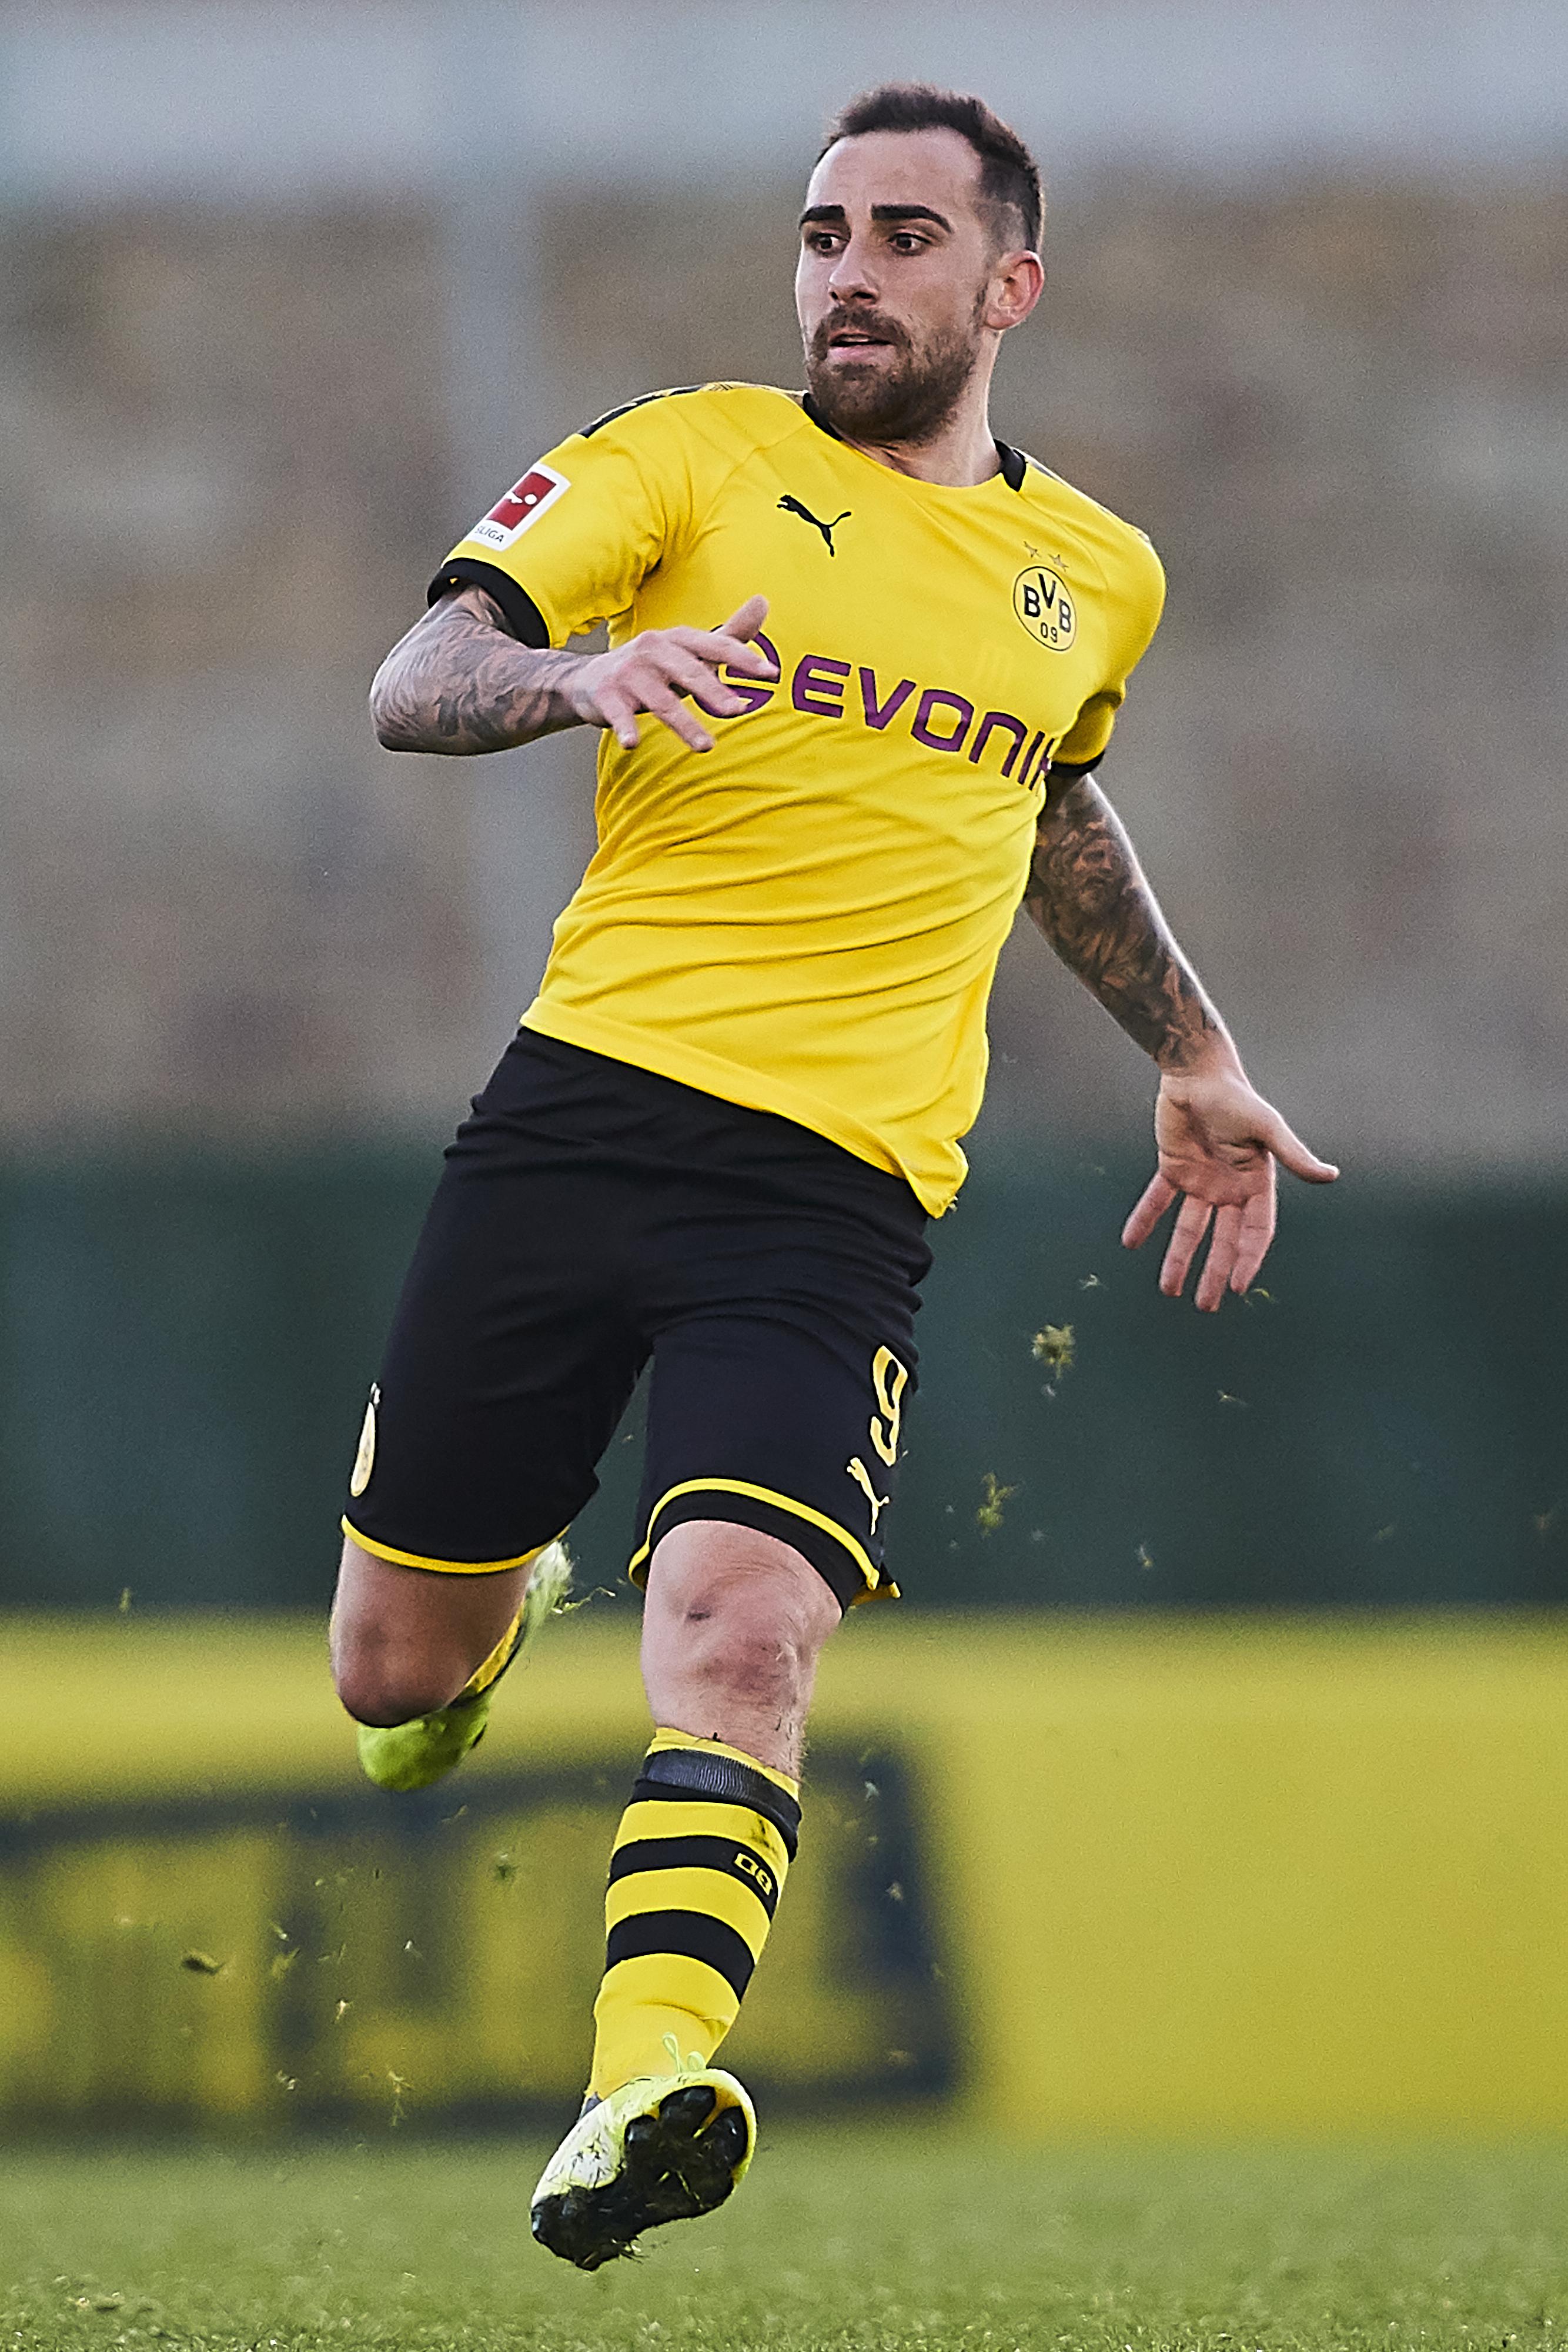 Borussia Dortmund v FSV Mainz 05 - Friendly Match